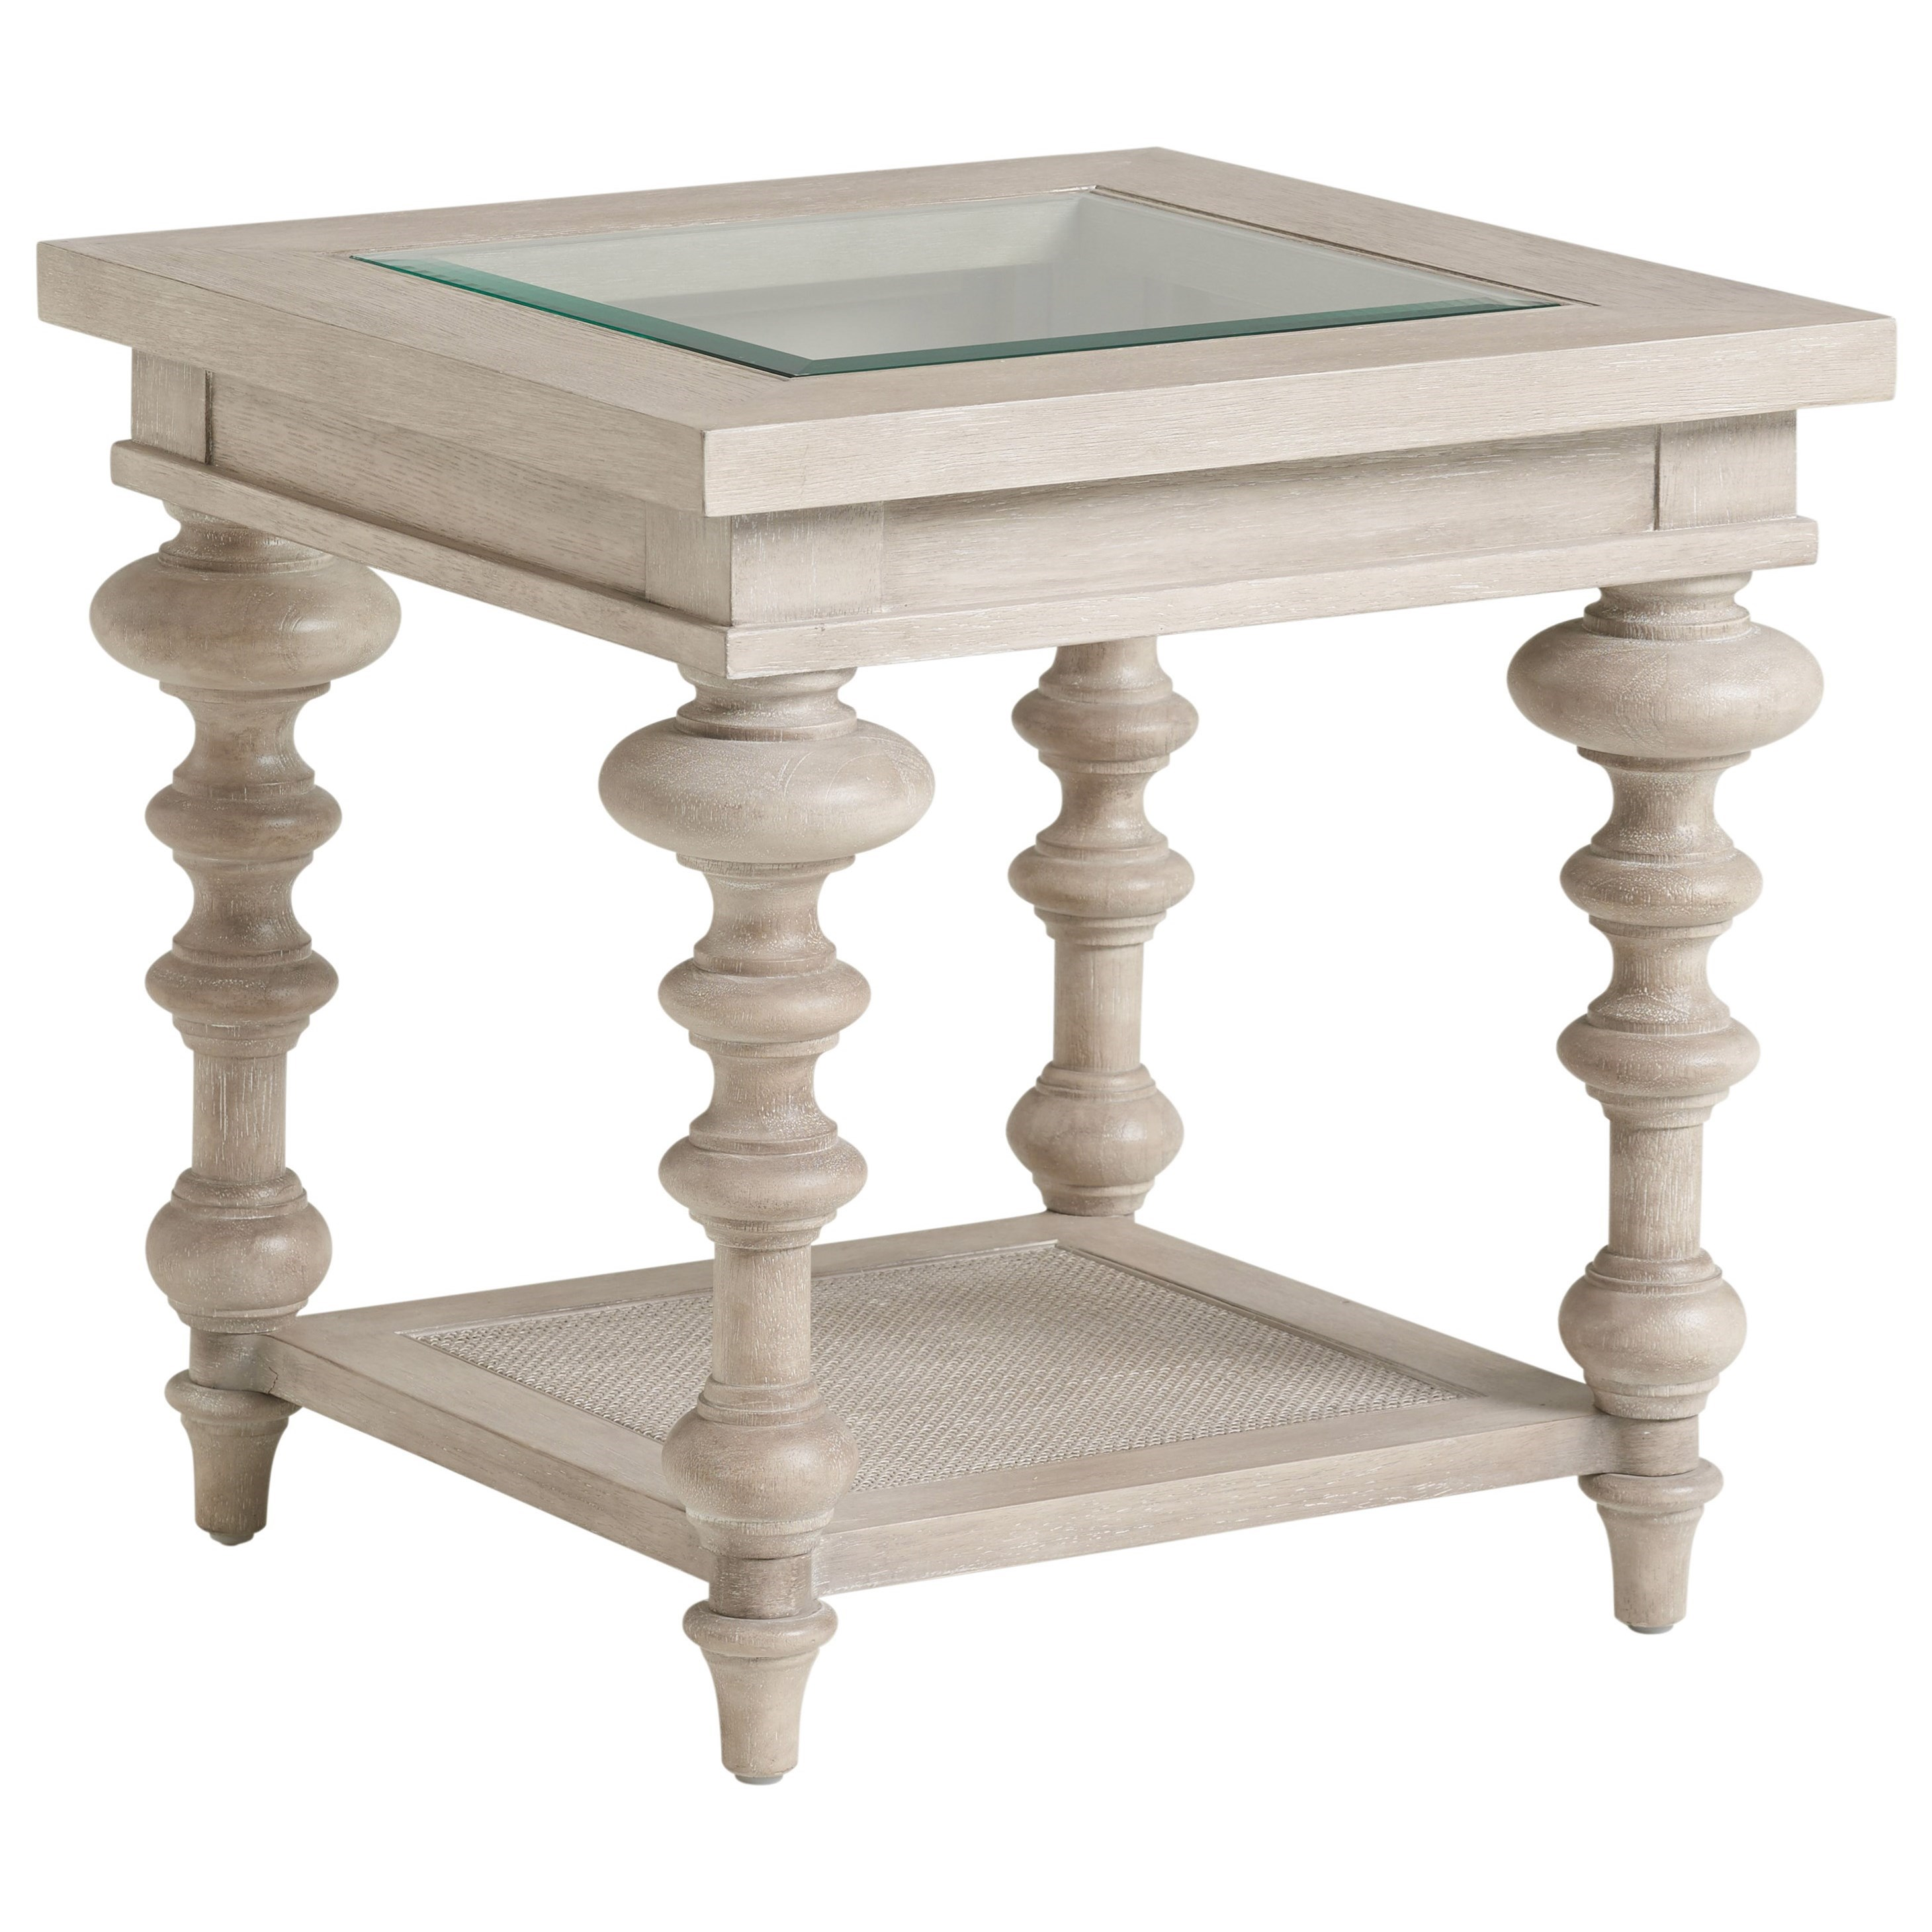 Malibu Castlerock End Table by Barclay Butera at Baer's Furniture